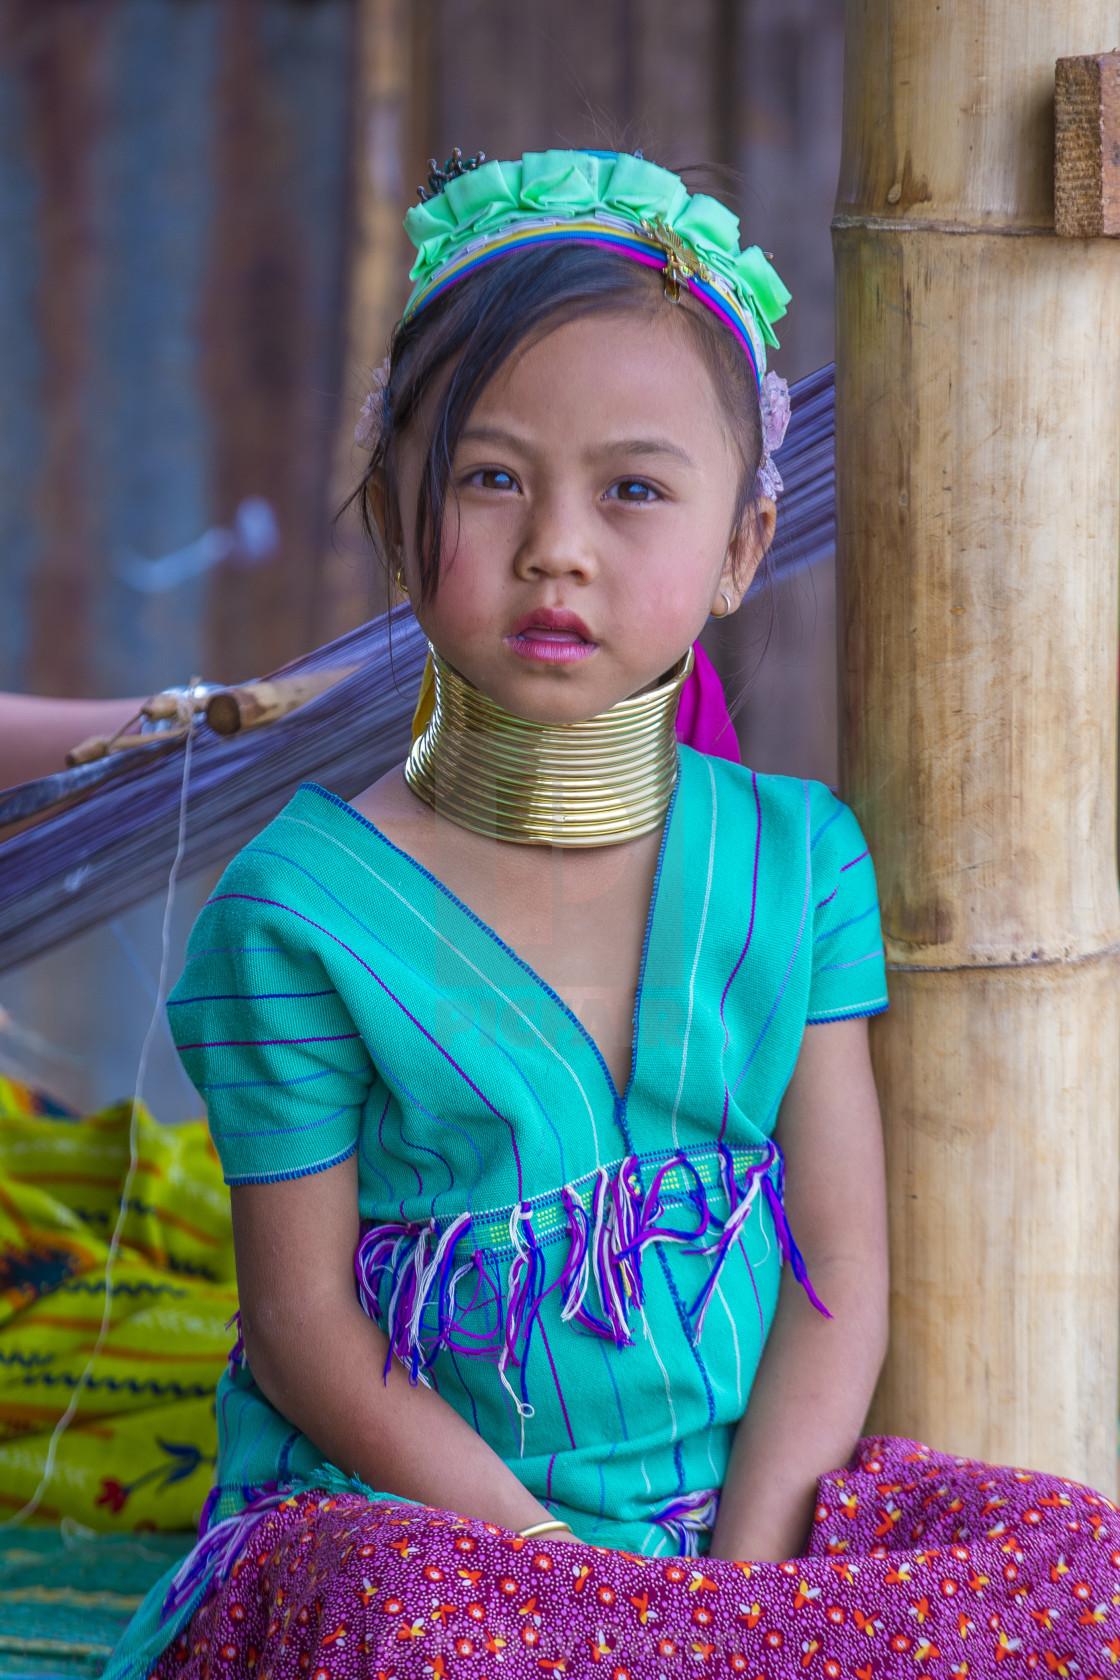 hustler-codes-necked-girl-videos-in-myanmar